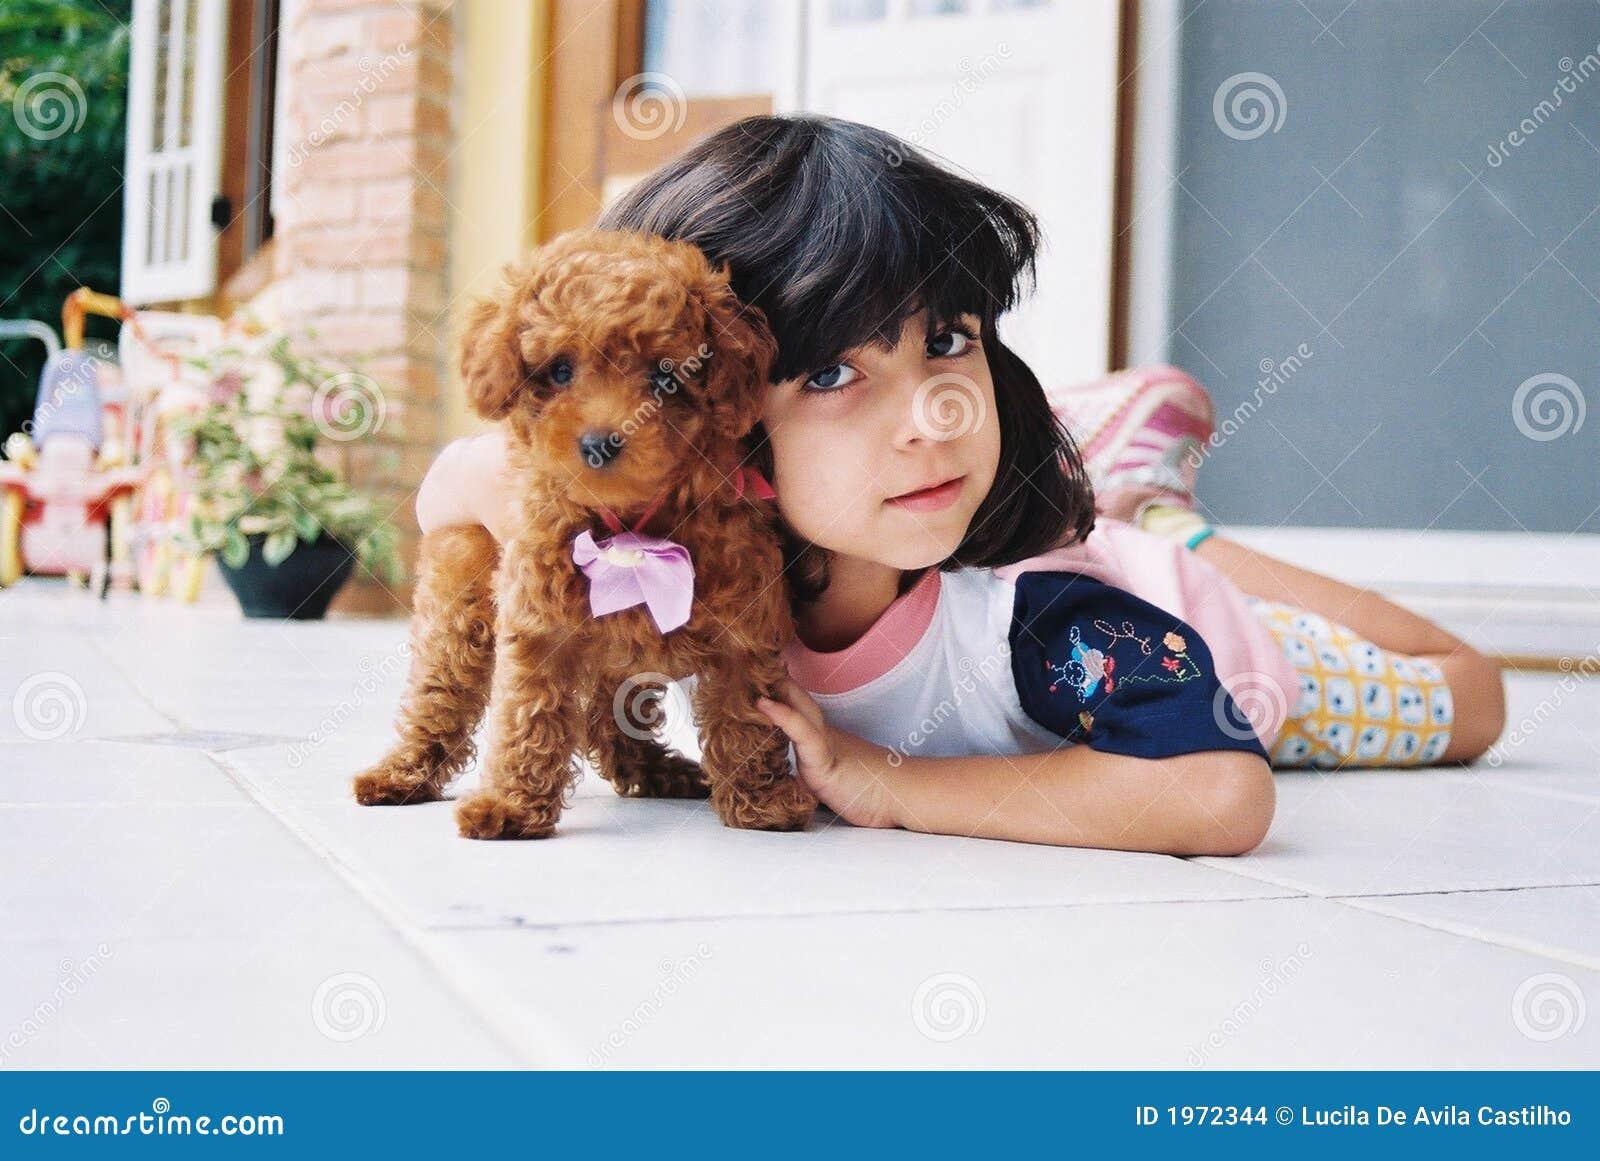 Quiero mi pequeño perro